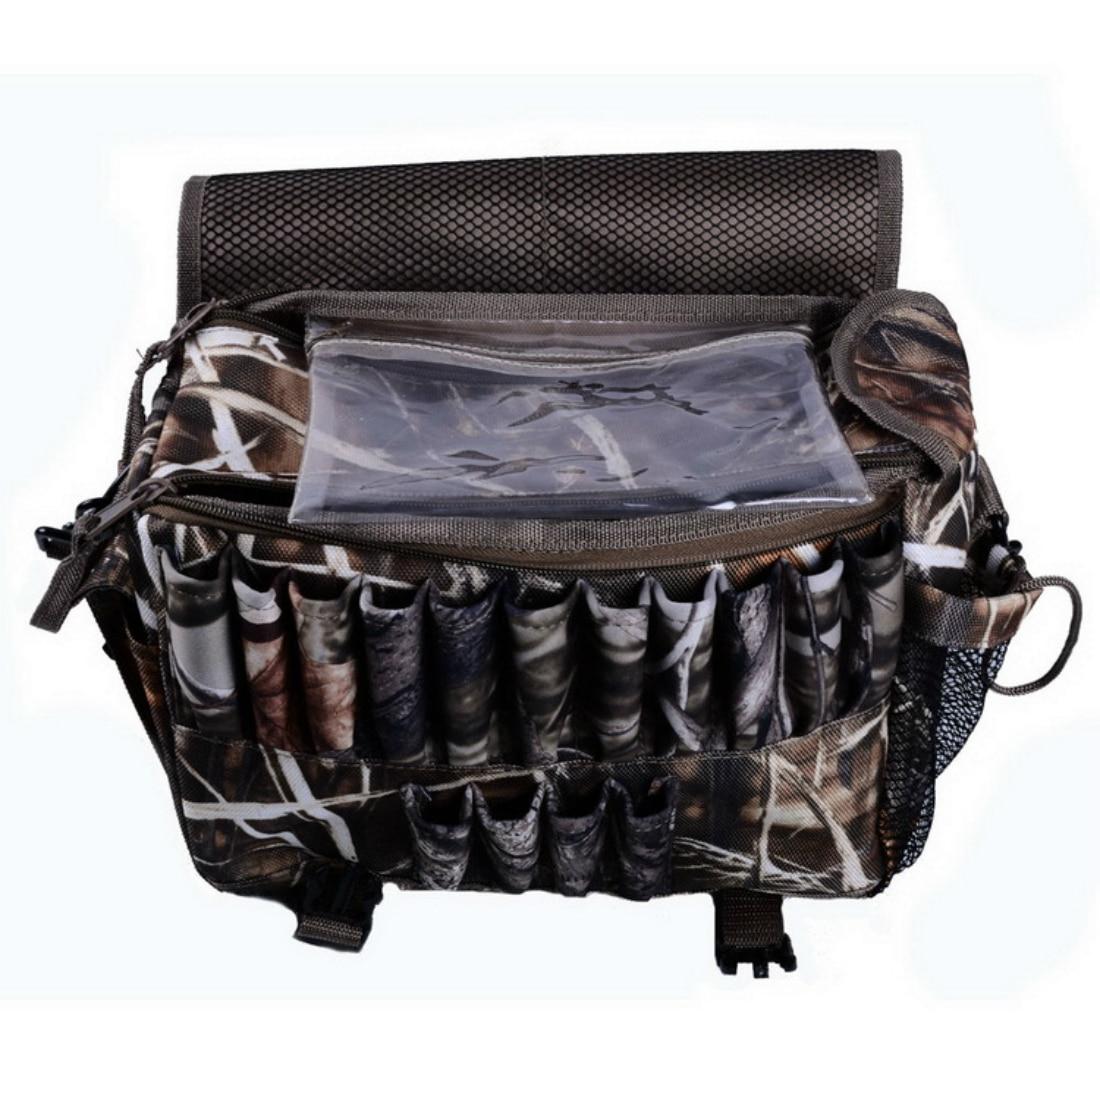 1200D Camouflage Deluxe Range Hunting Bag Duffle Military Molle Gear Shoulder Strap Range Bag Tactical Military Sport Bag<br>